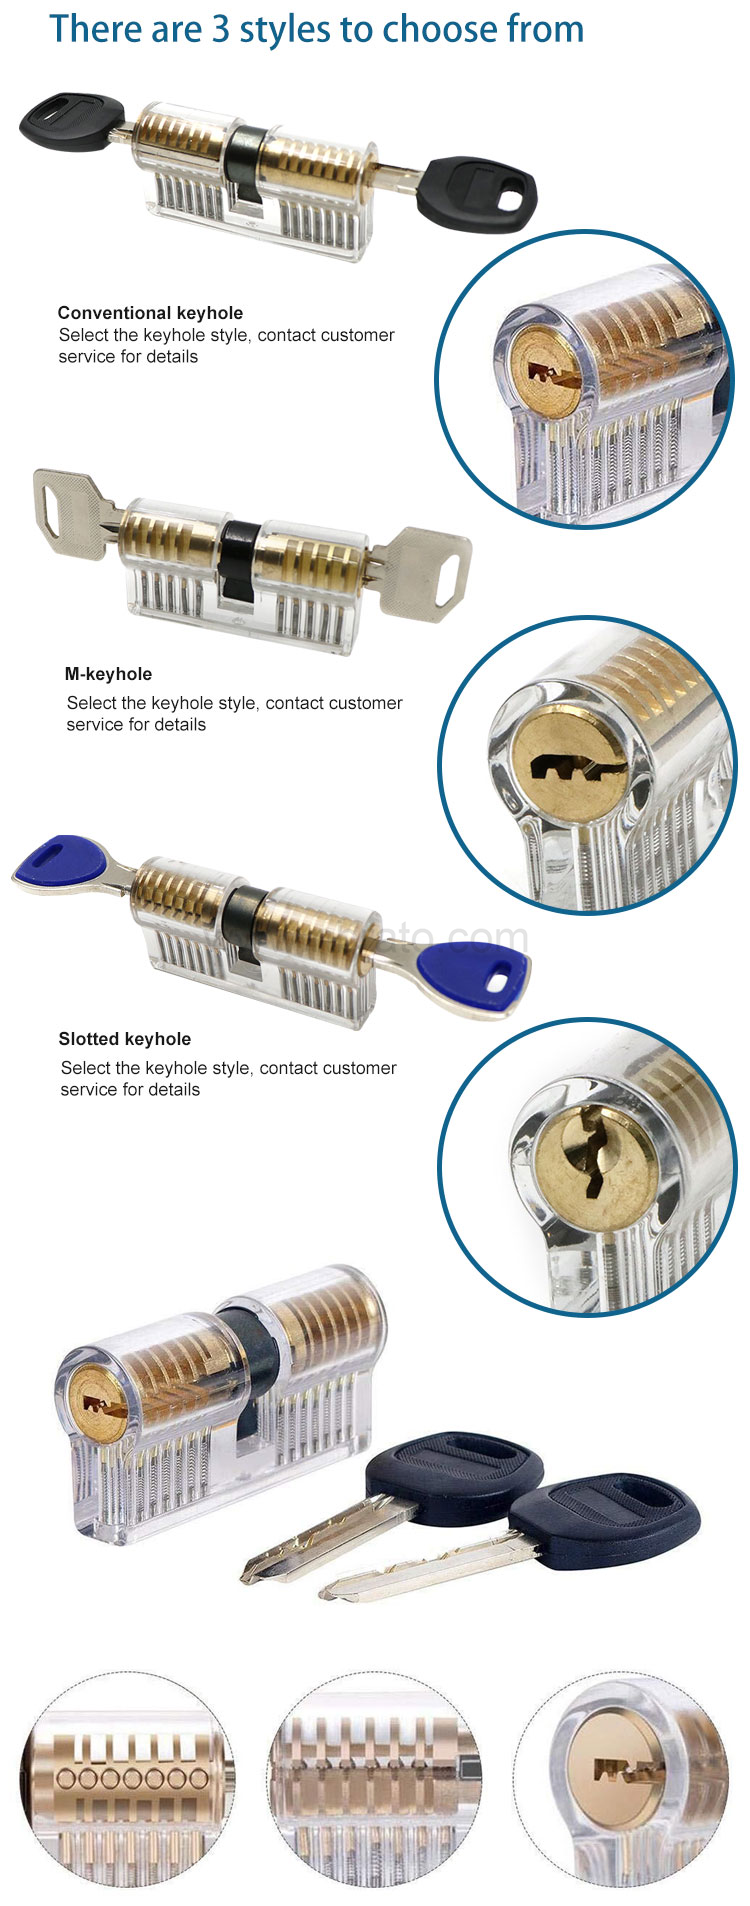 Acrylic Material Shell Clear Padlock Waterproof Locksmith Training Transparent Practice Locks